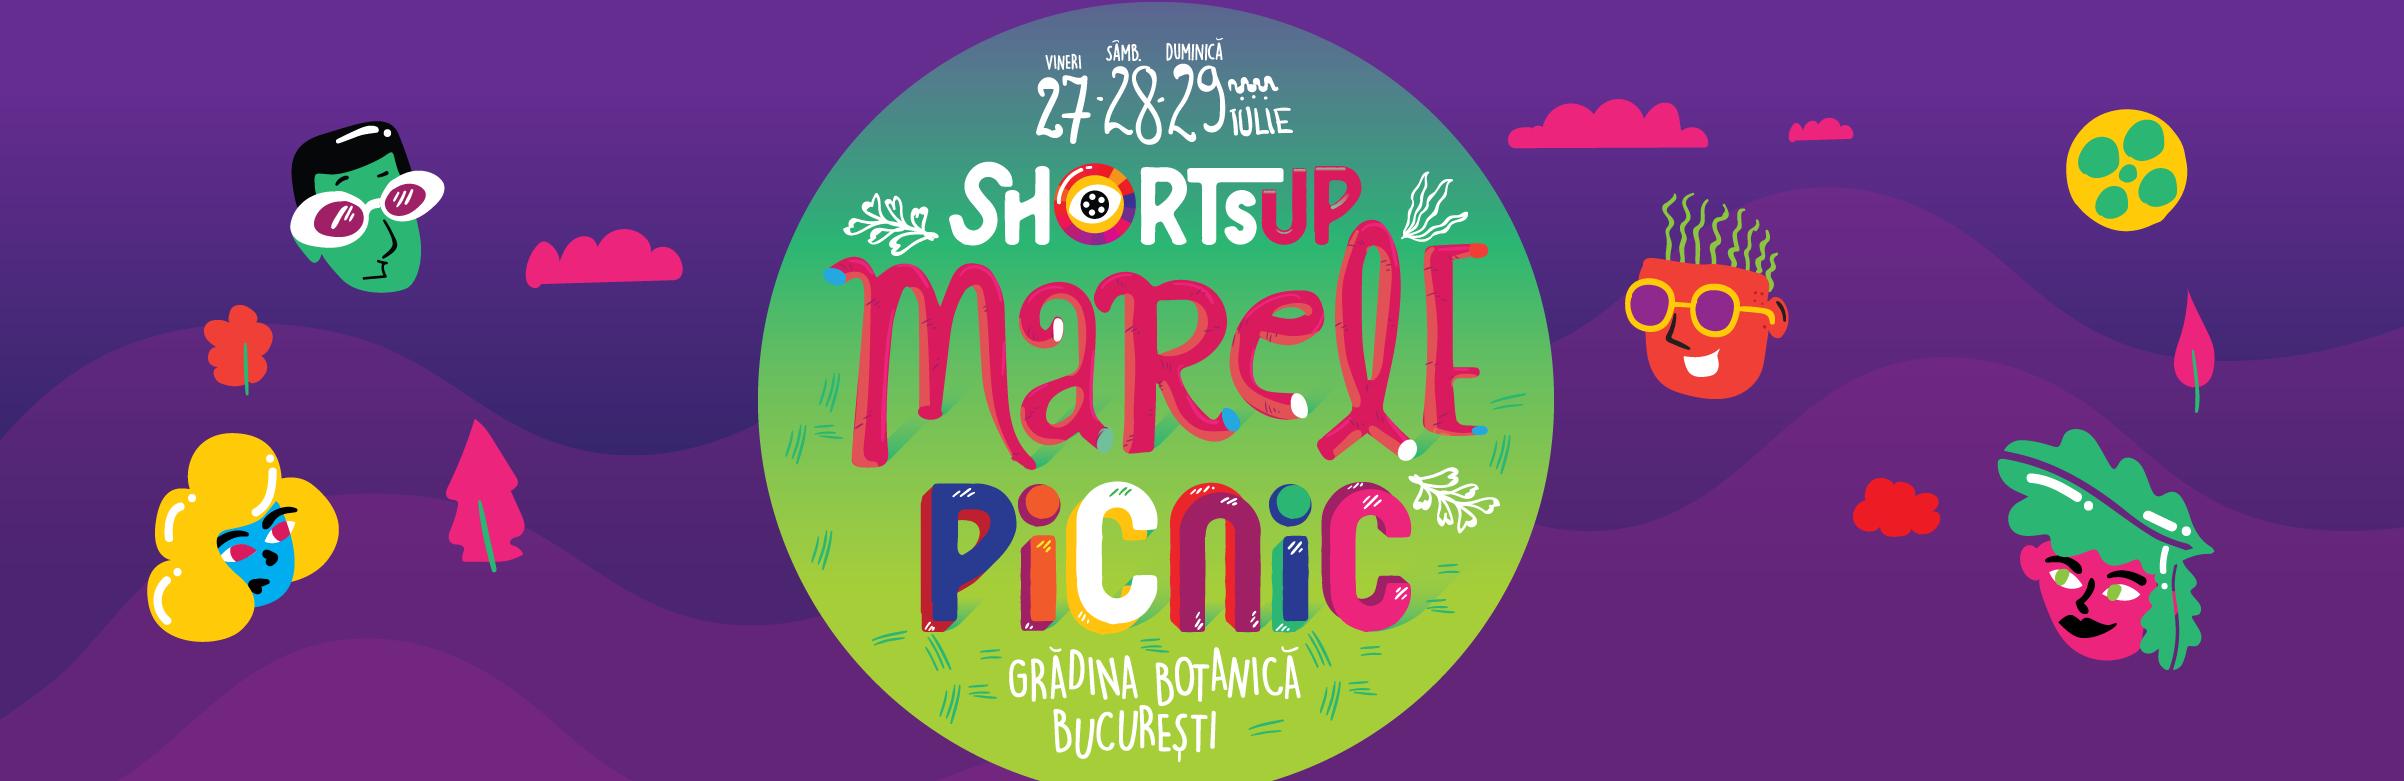 marele_picnic_slider (1)